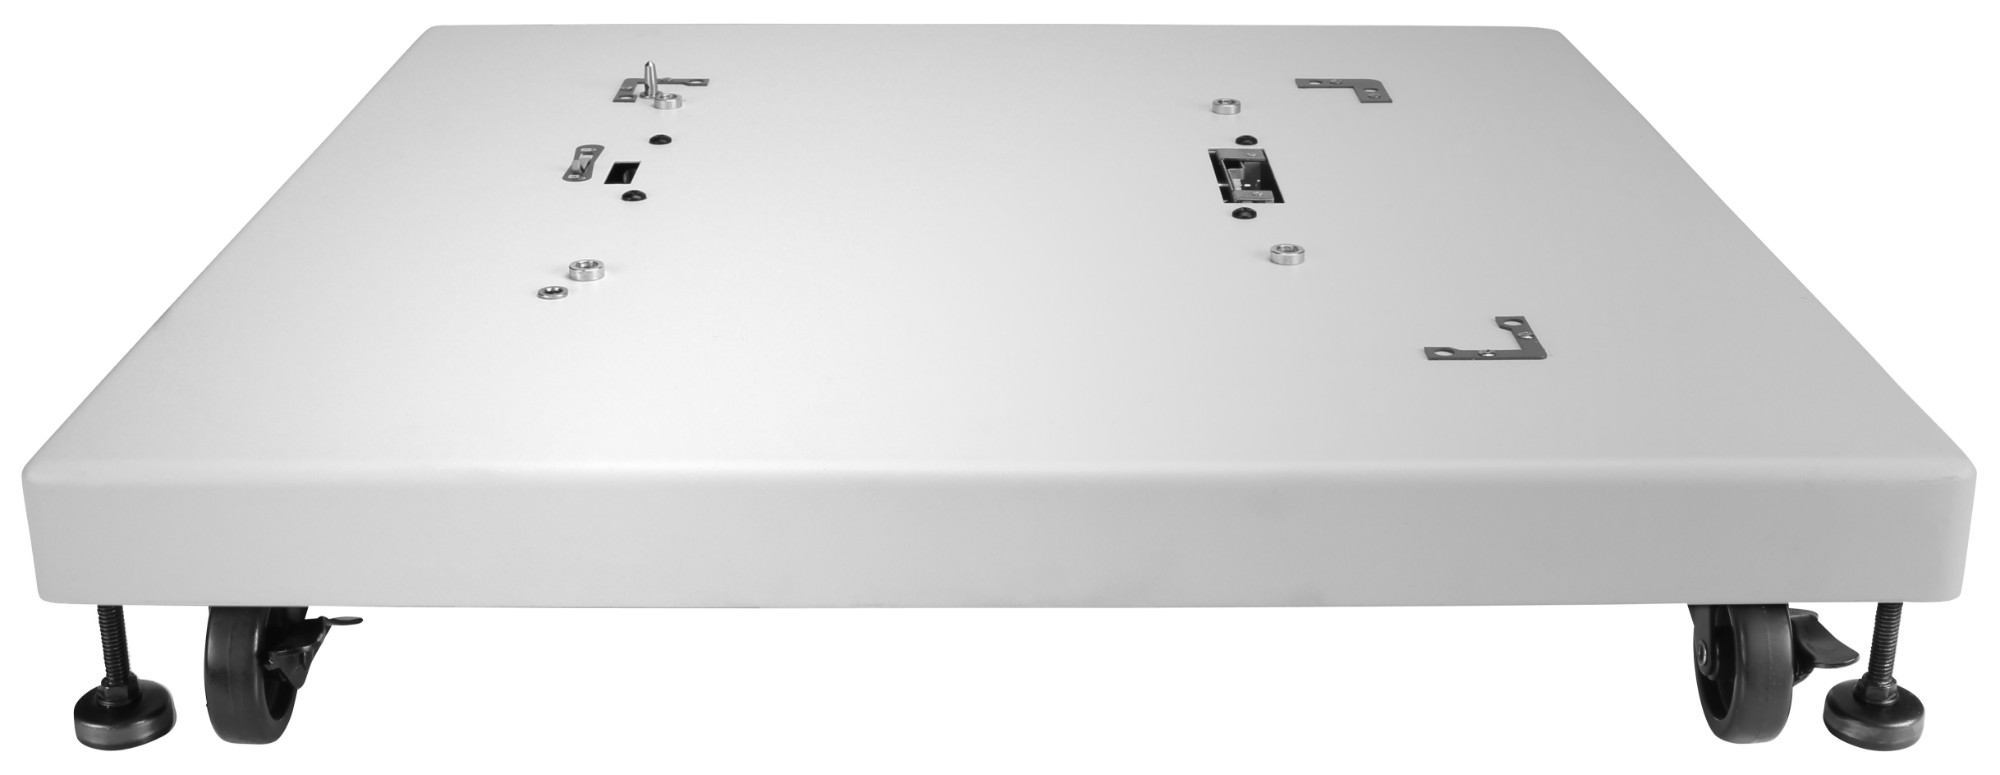 HP LaserJet Printer Stand printer cabinet/stand